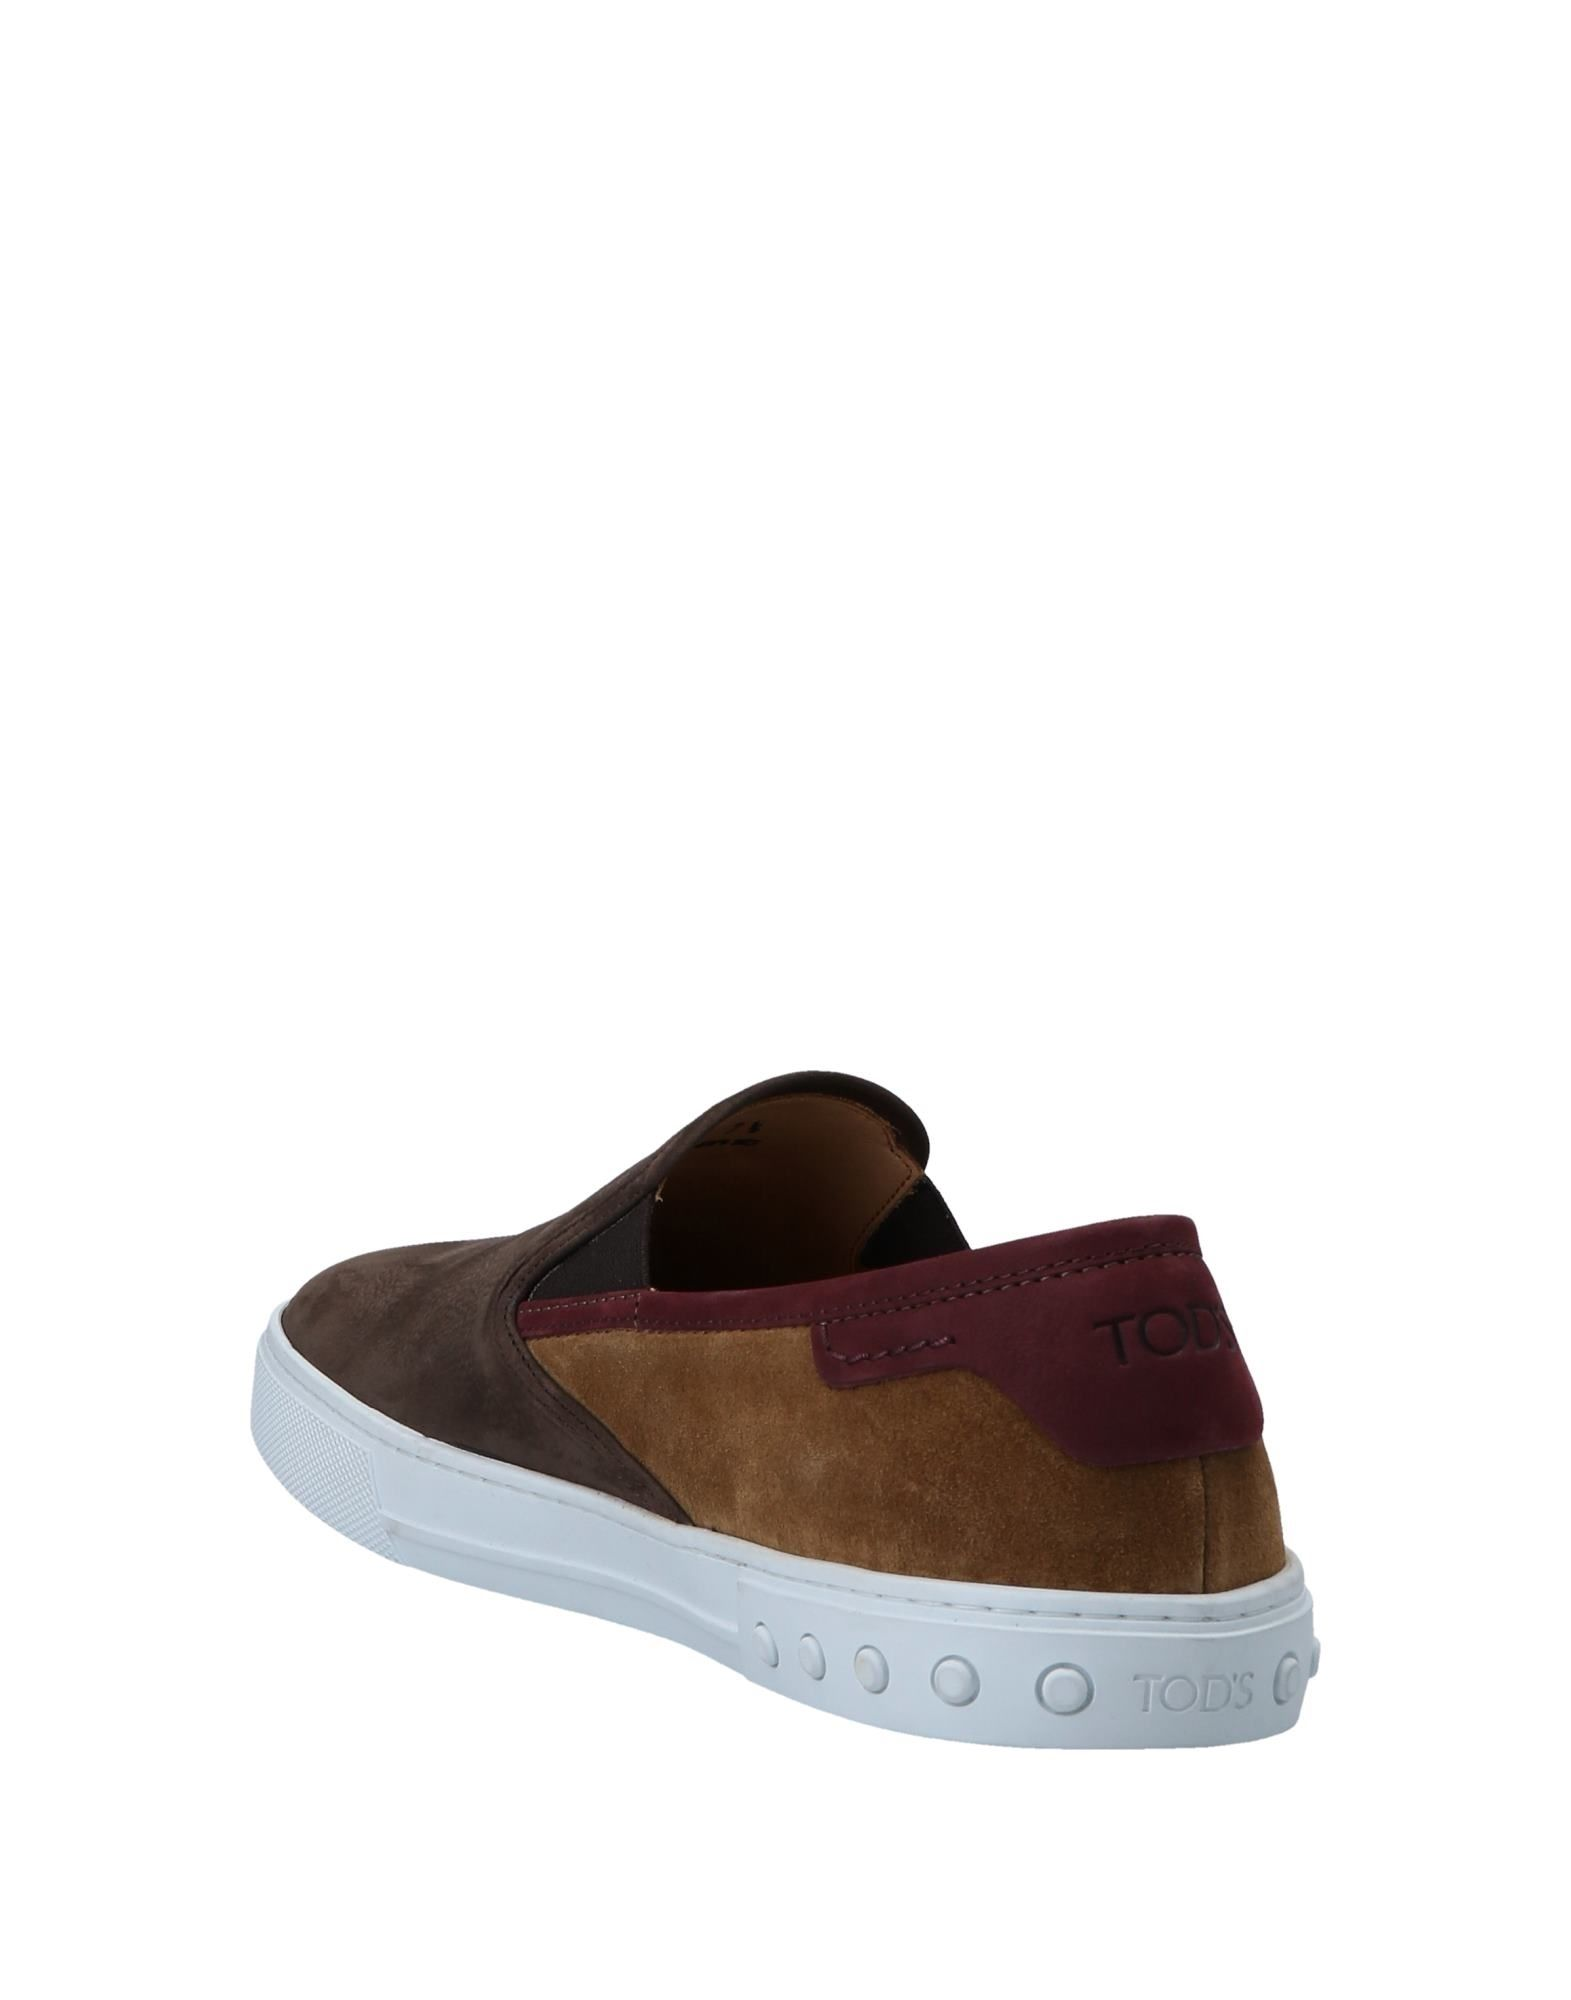 Tod's Tod's Tod's Sneakers Herren  11541645UU Gute Qualität beliebte Schuhe 8c8ccb